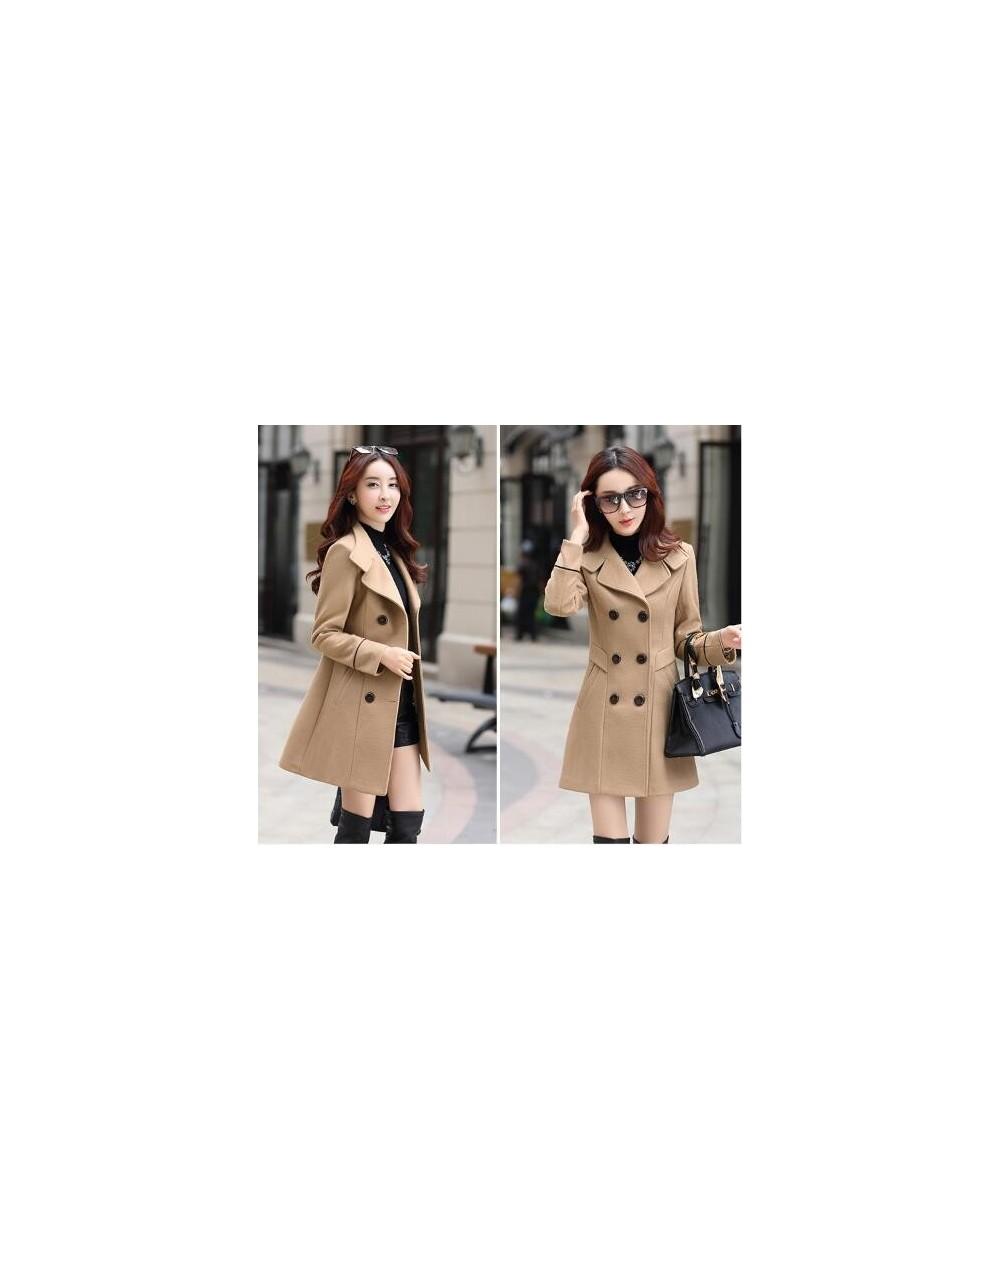 Autumn Winter Women Wool Coats Jackets Double Breasted Slim Outwear Coat Womens Bodycon Long Overcoat Tops Casaco Feminino -...